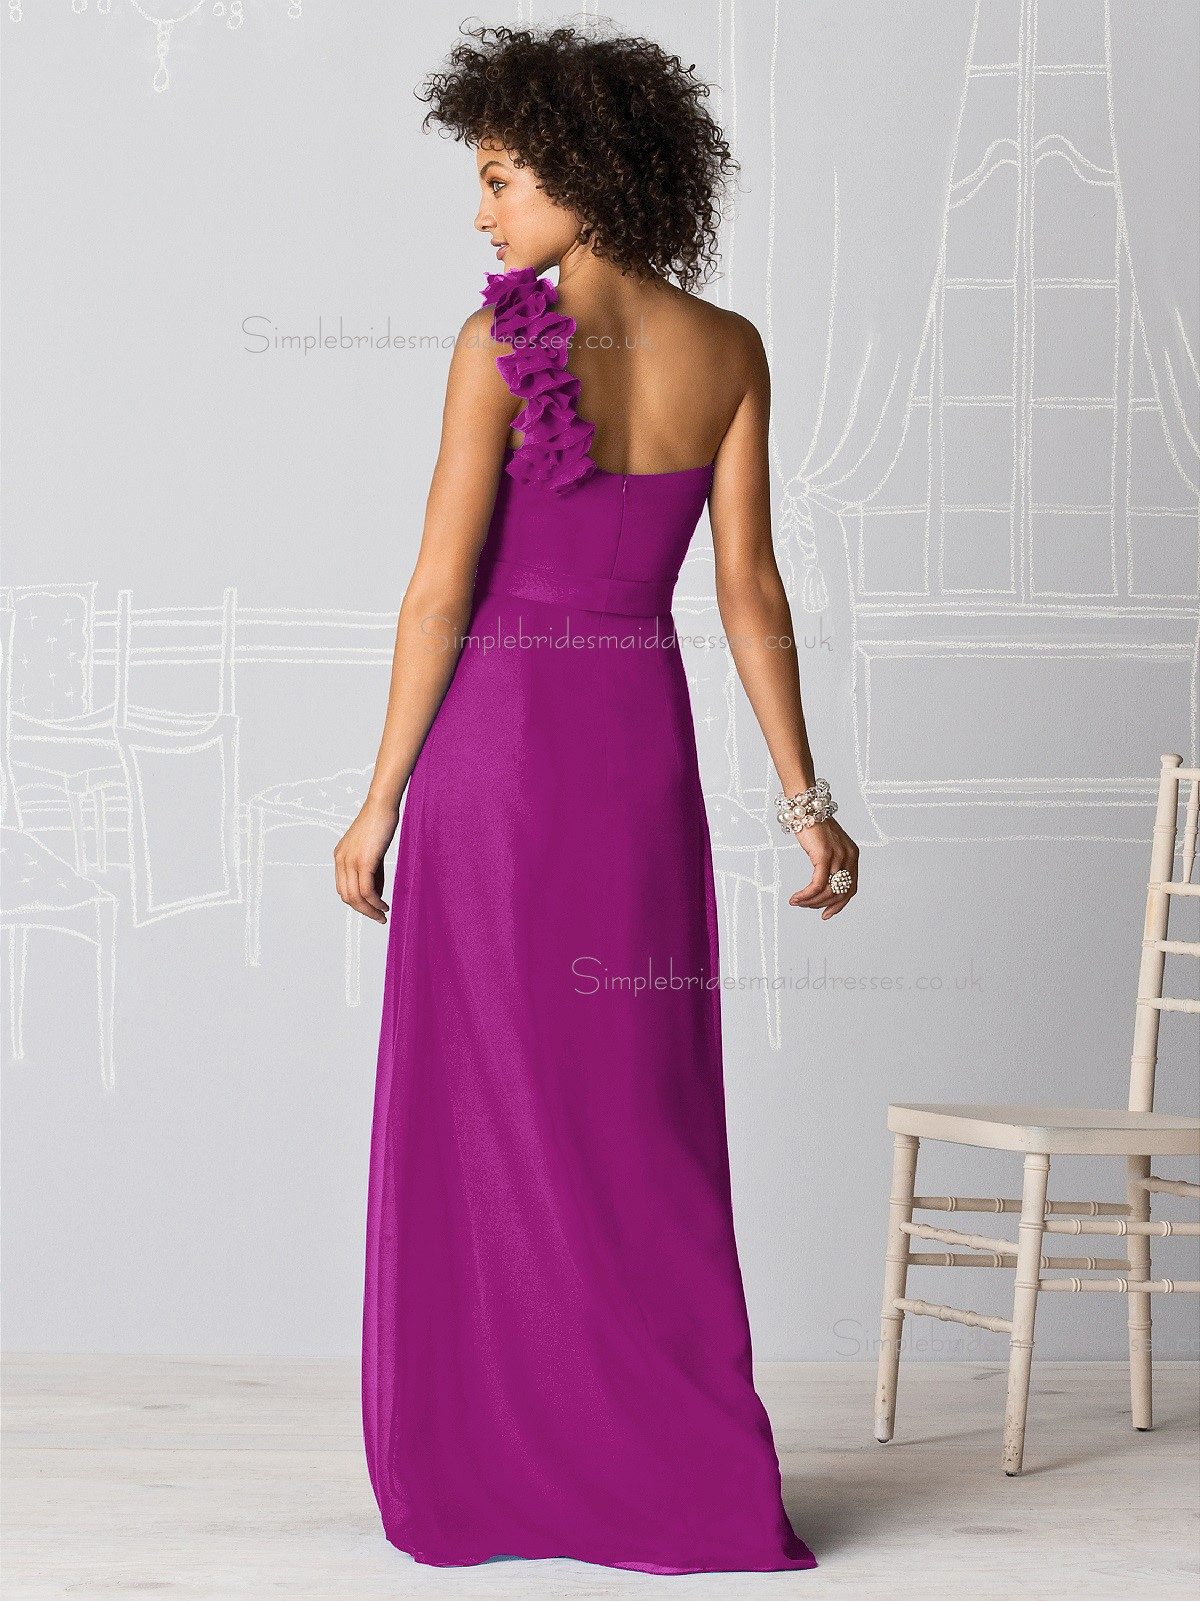 Persian plum bridesmaid dresses uk wedding dress shops persian plum bridesmaid dresses uk 101 ombrellifo Image collections